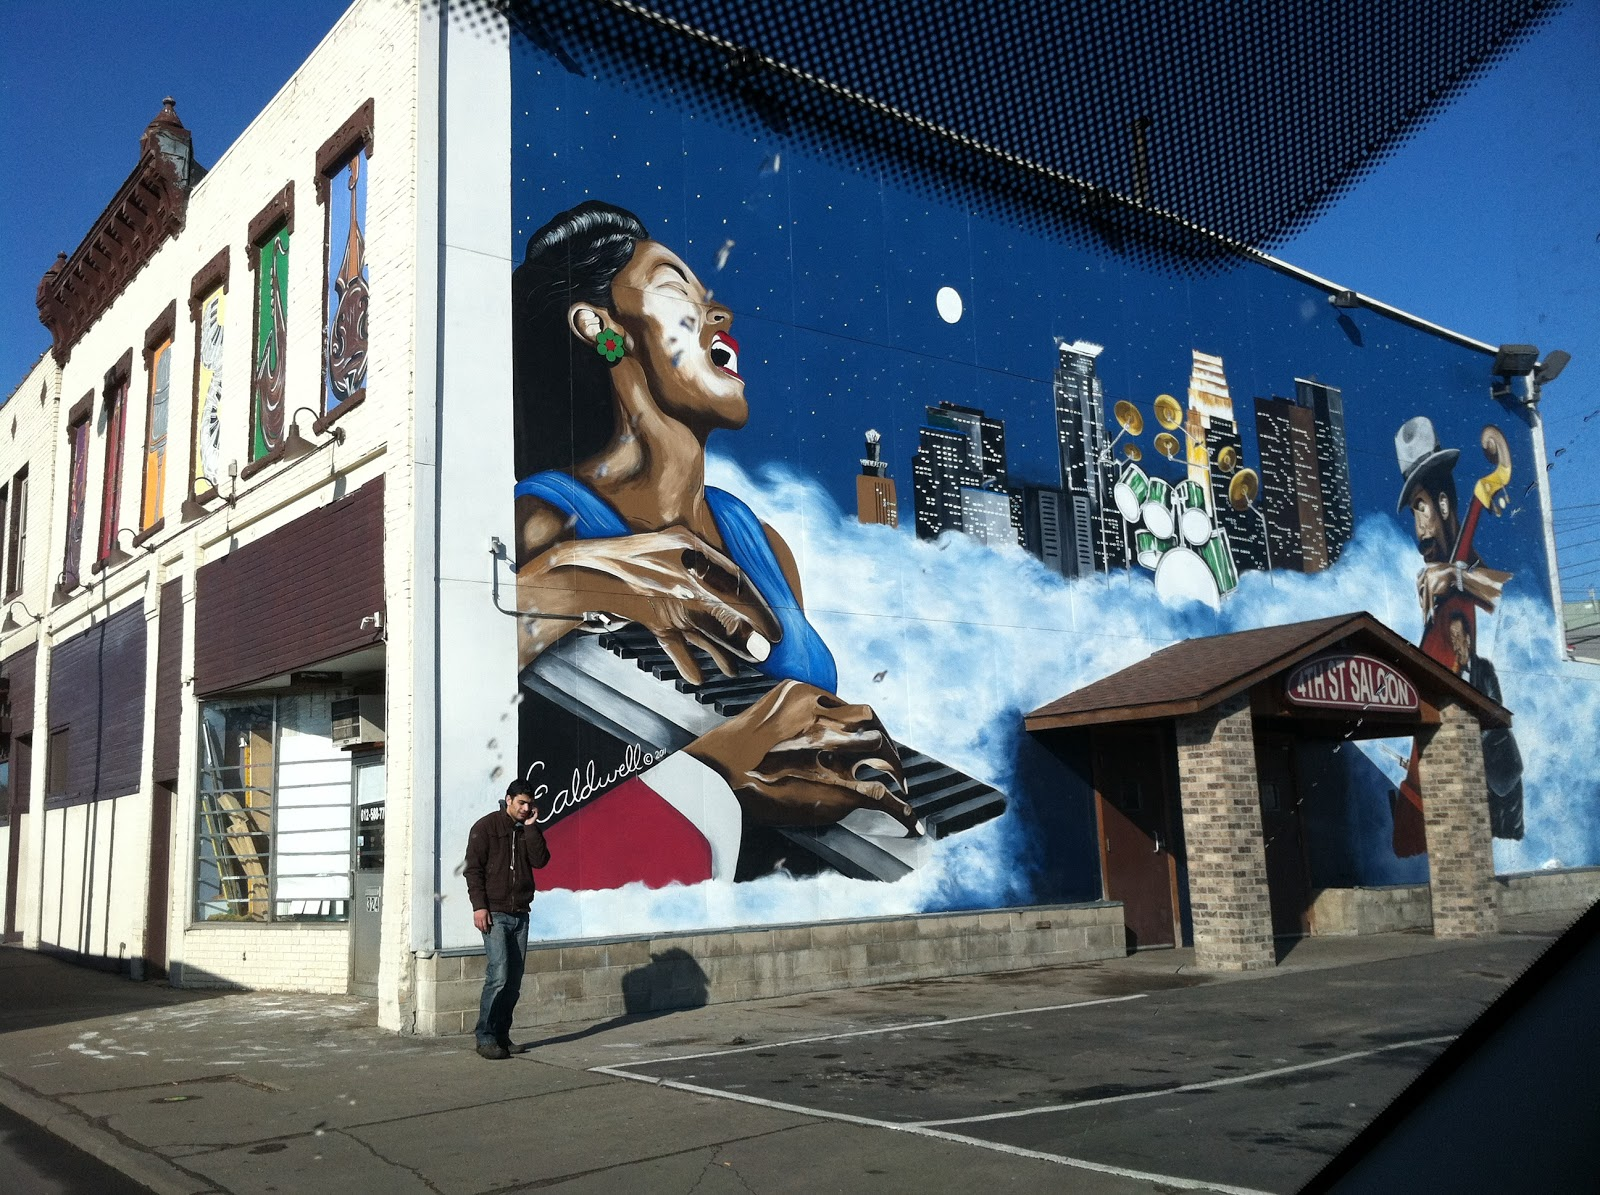 Mural by c caldwell charles caldwell minneapolis artist for Ecole d art mural